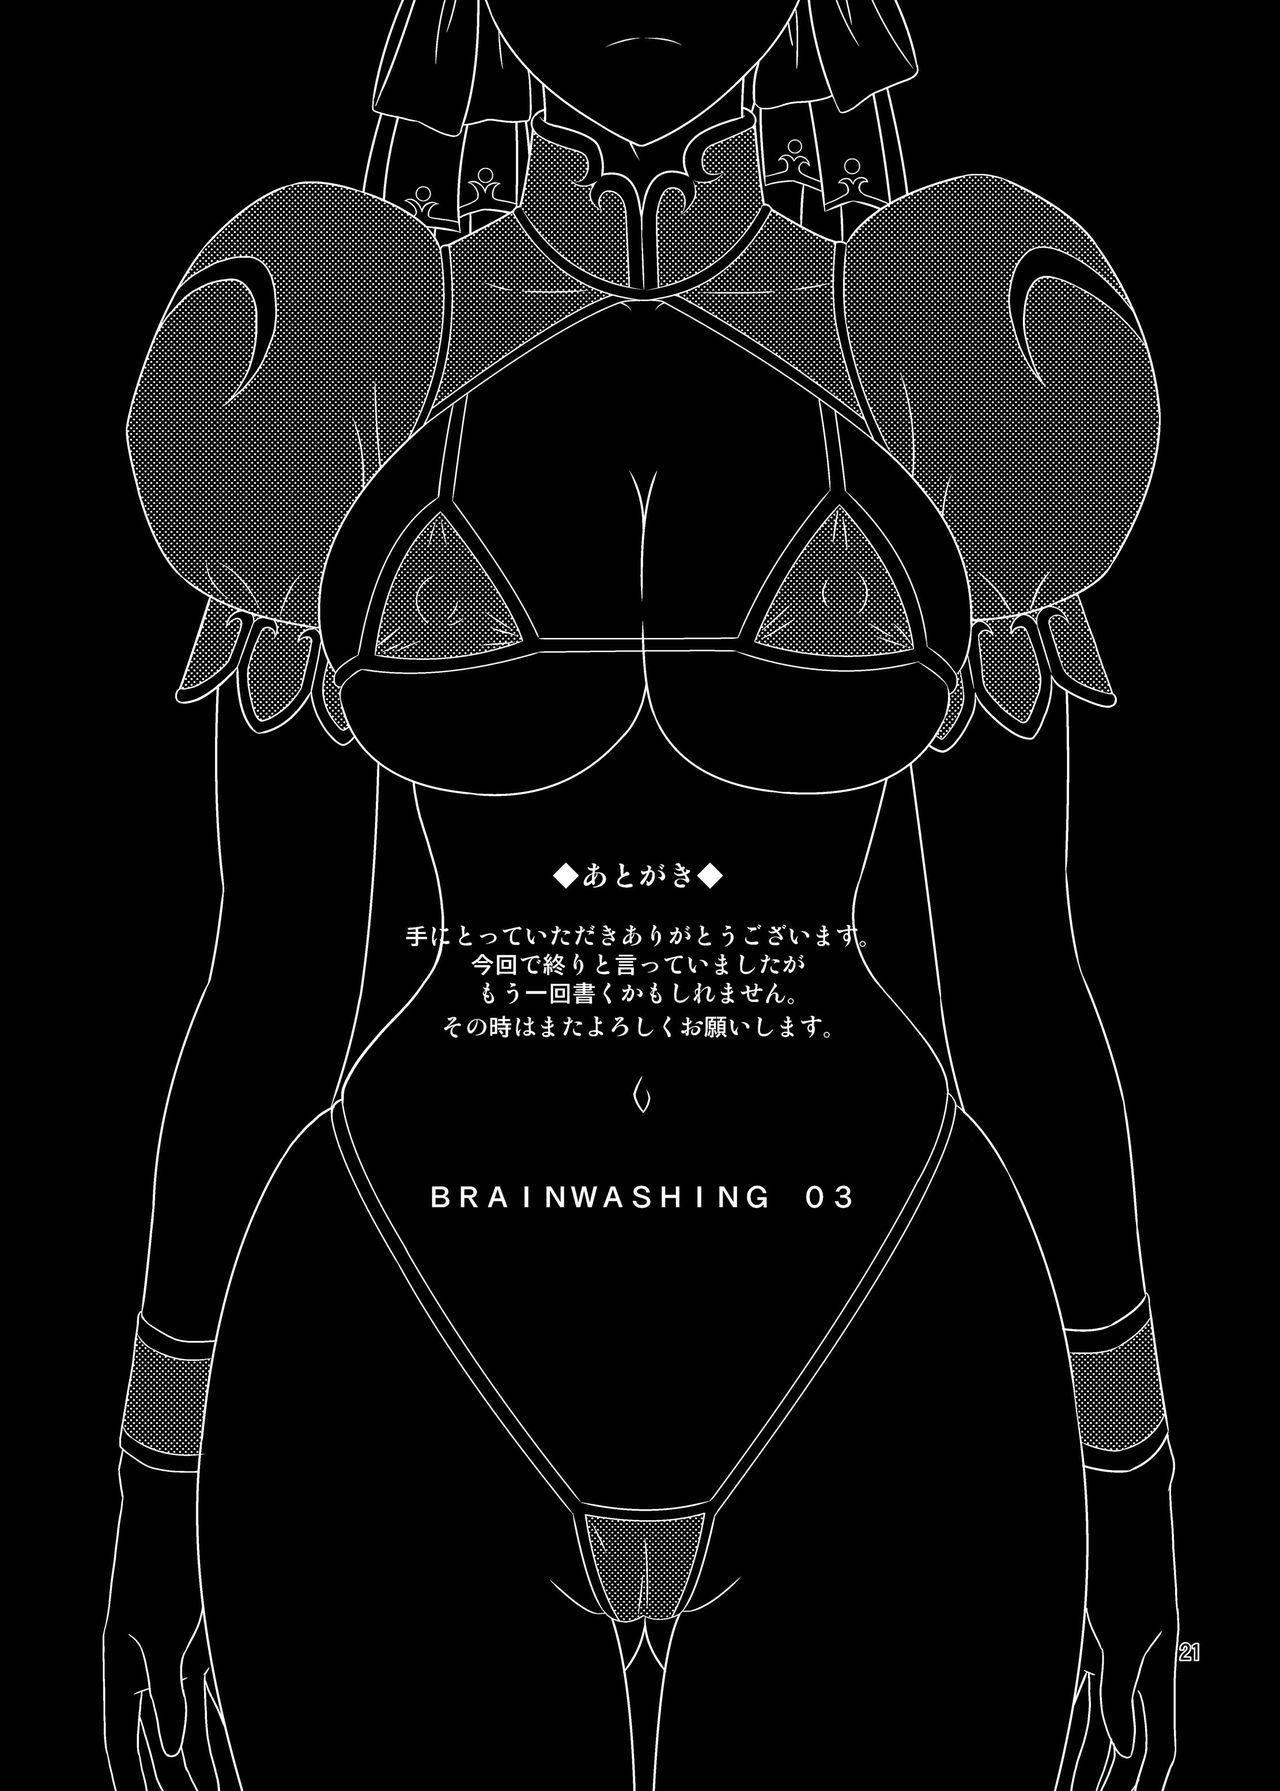 Brainwashing 03 20